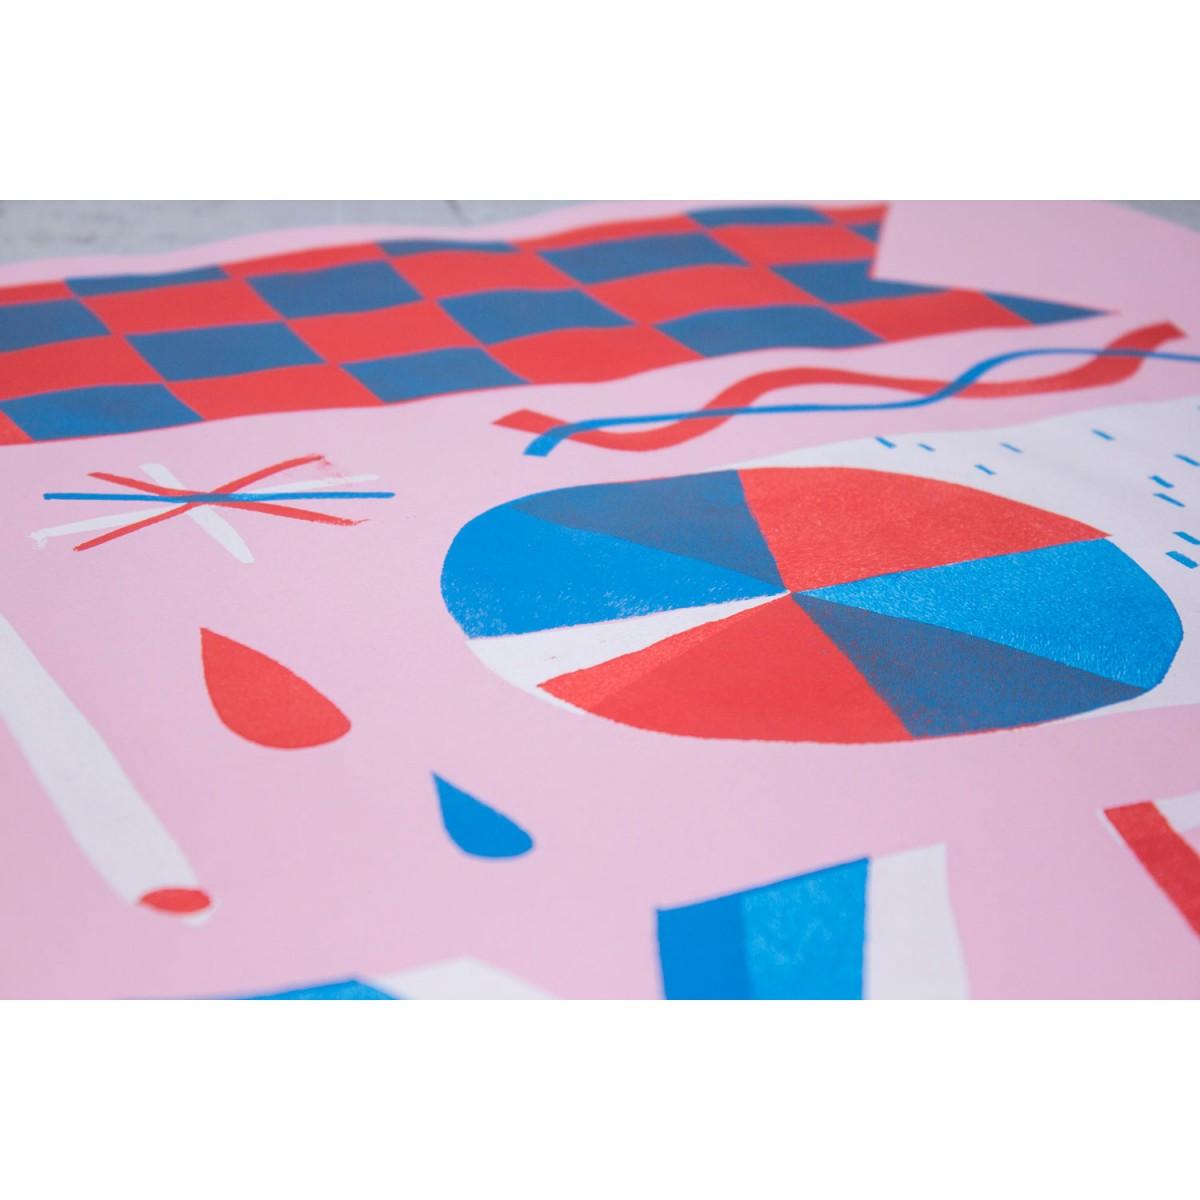 Stencil Artprint »YES«, 50x70cm